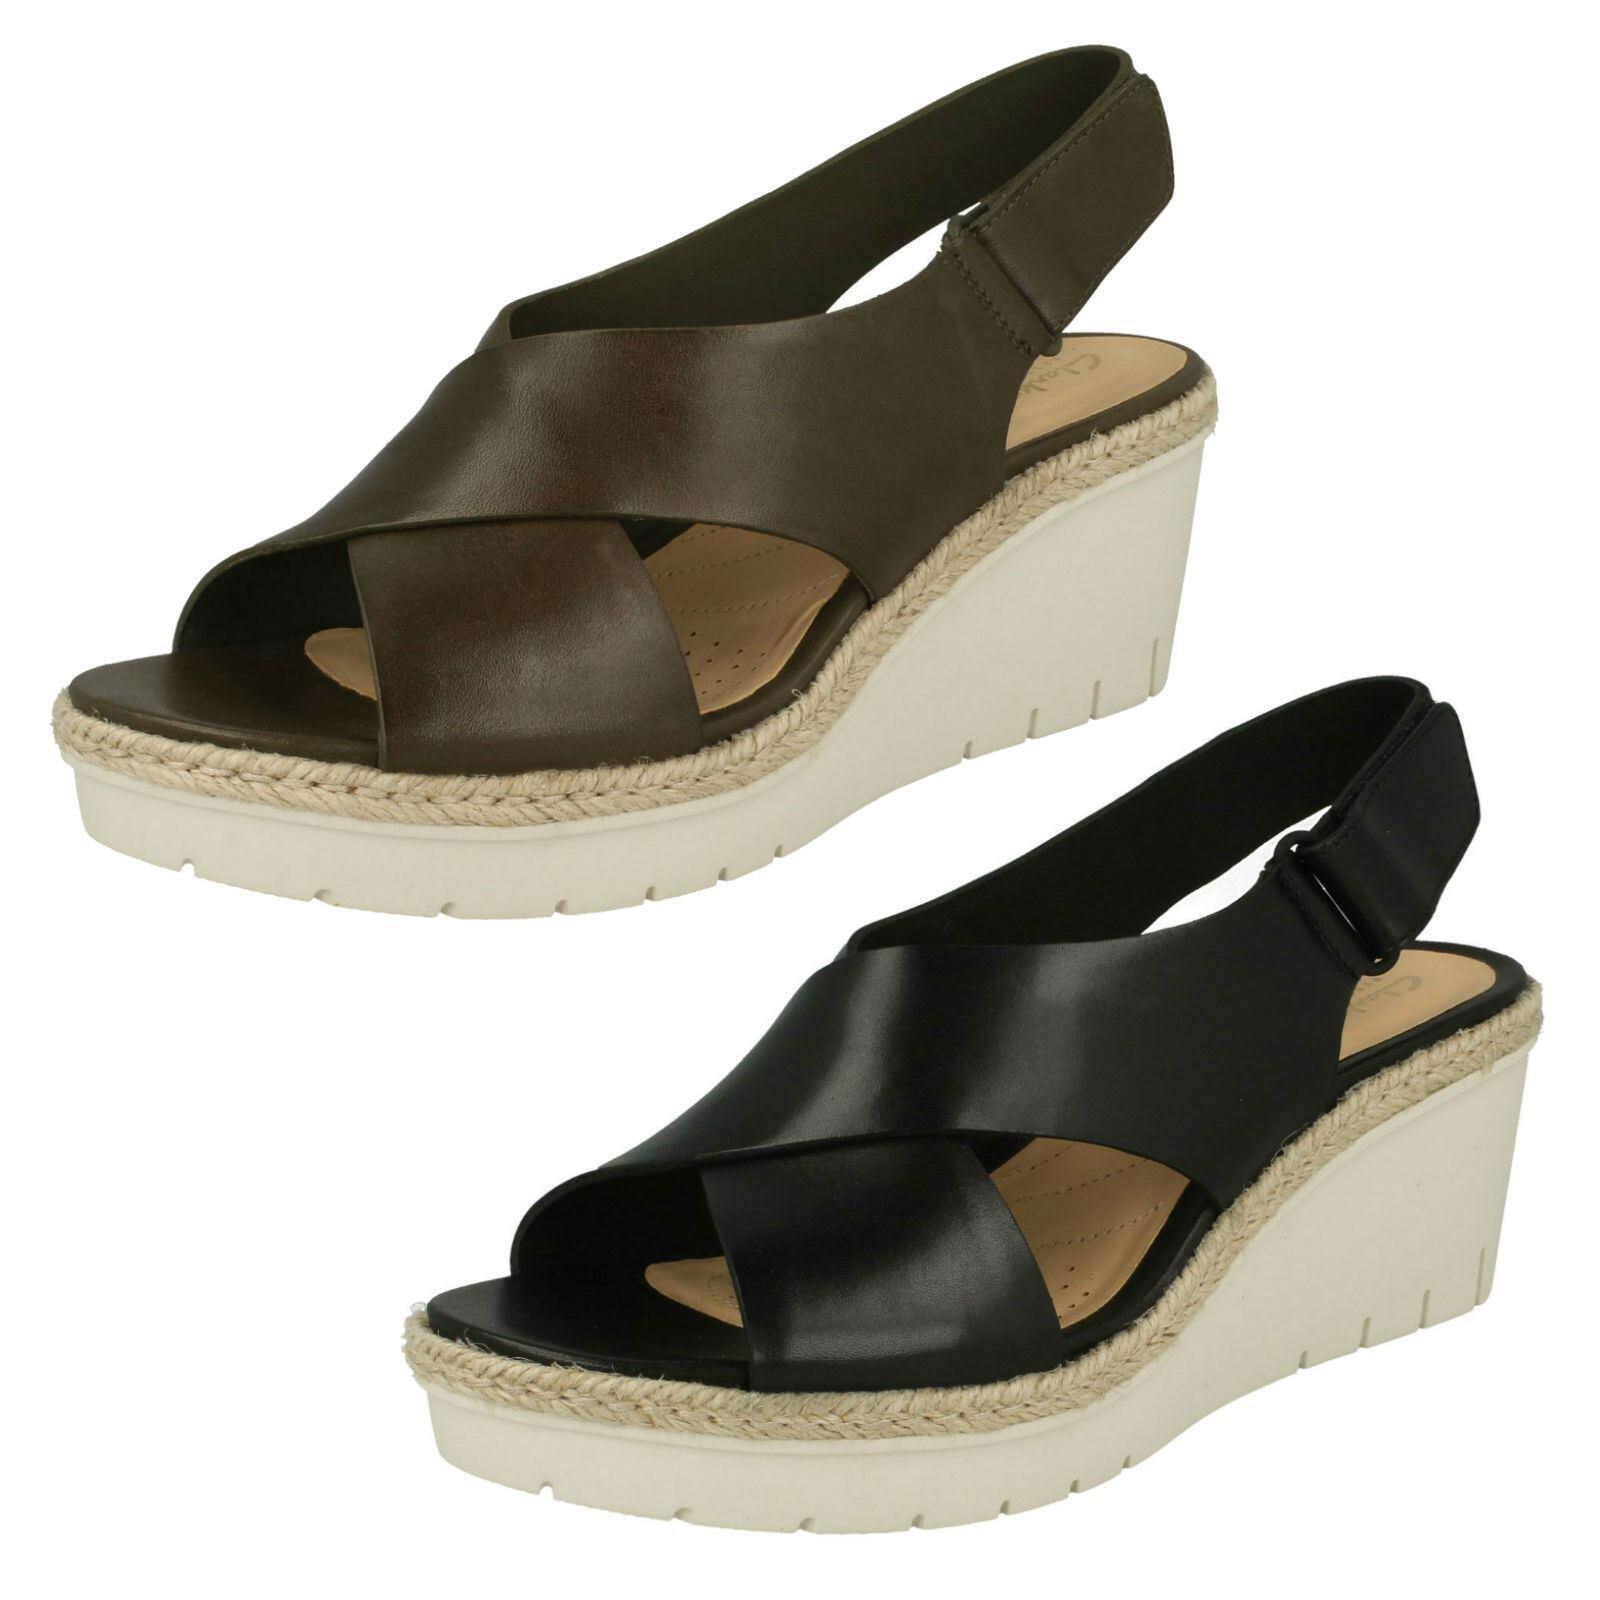 Último gran descuento Ladies Clarks Wedged Heel Slingback Sandals 'Palm Glow'